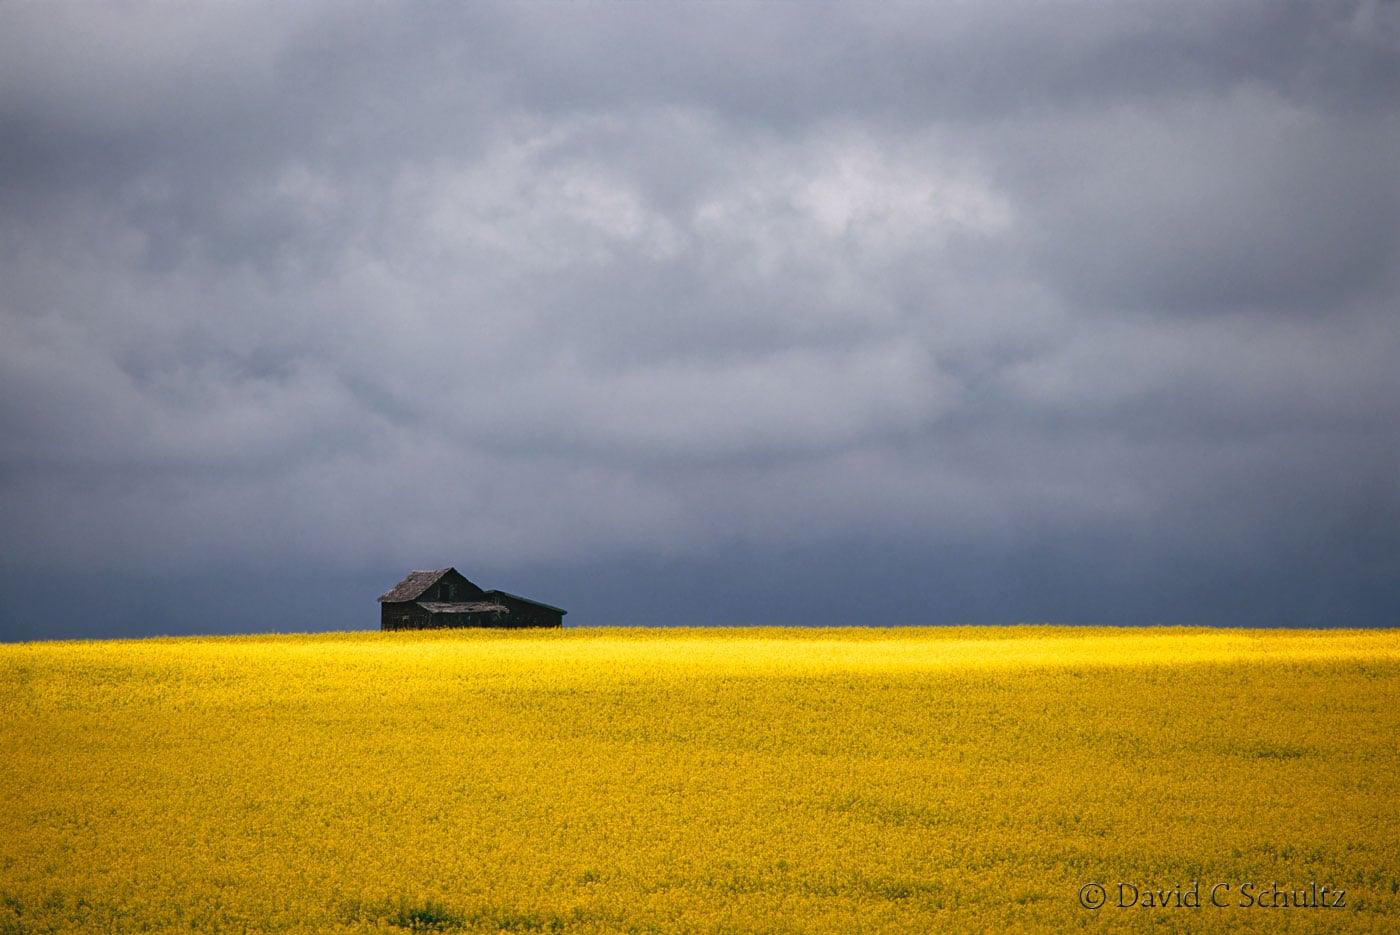 Canola field in bloom in Alberta, Canada - Image #7-1376